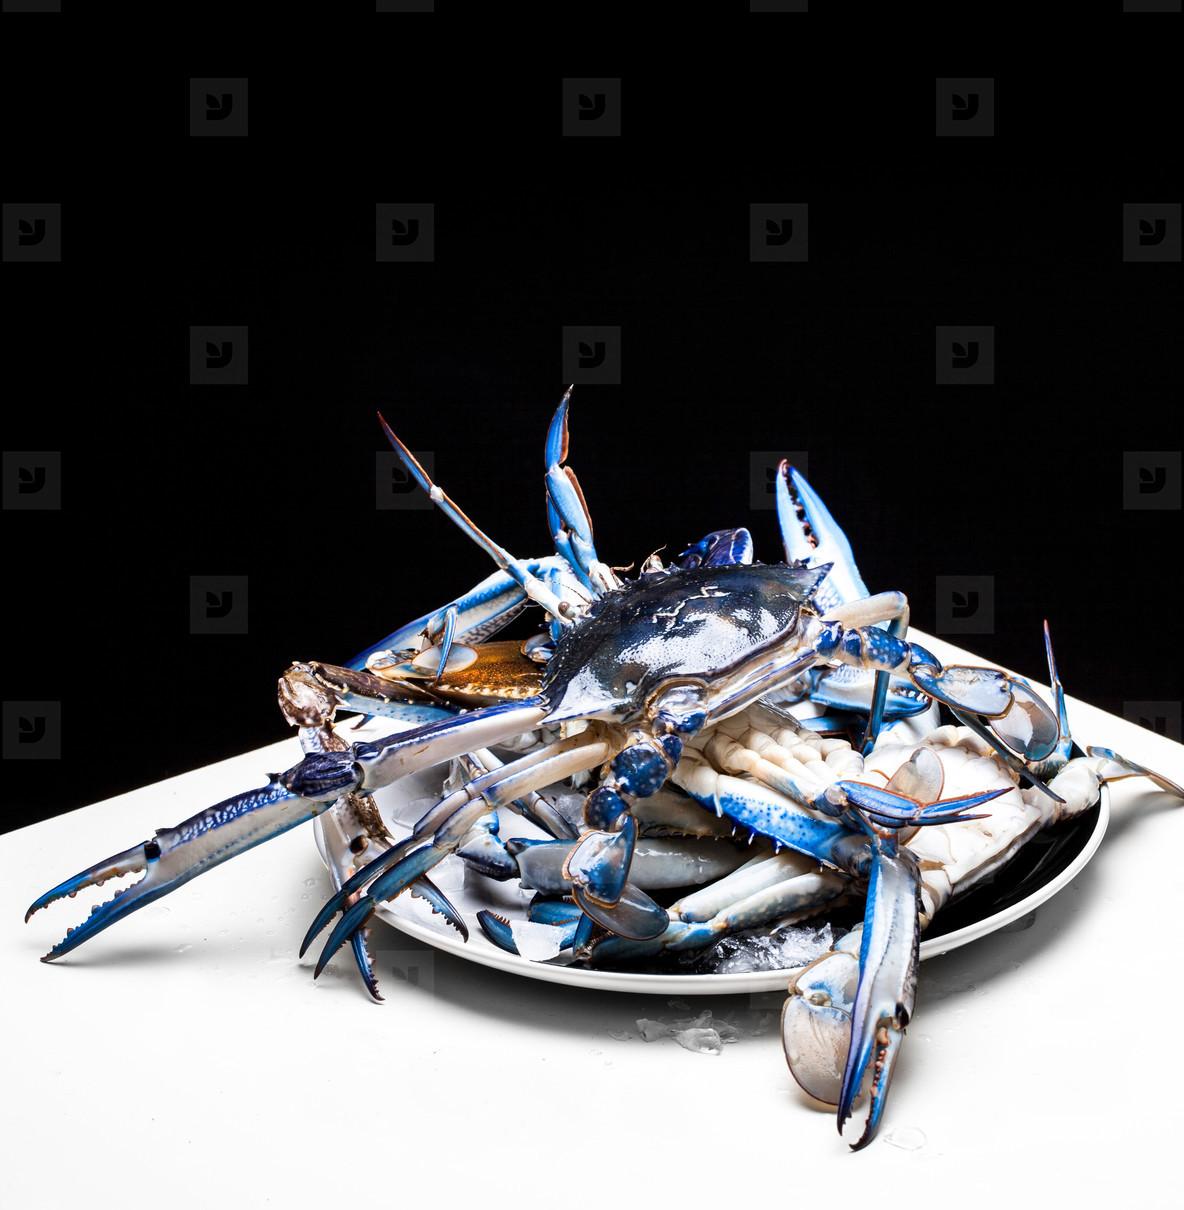 Fresh Blue swimmer crab